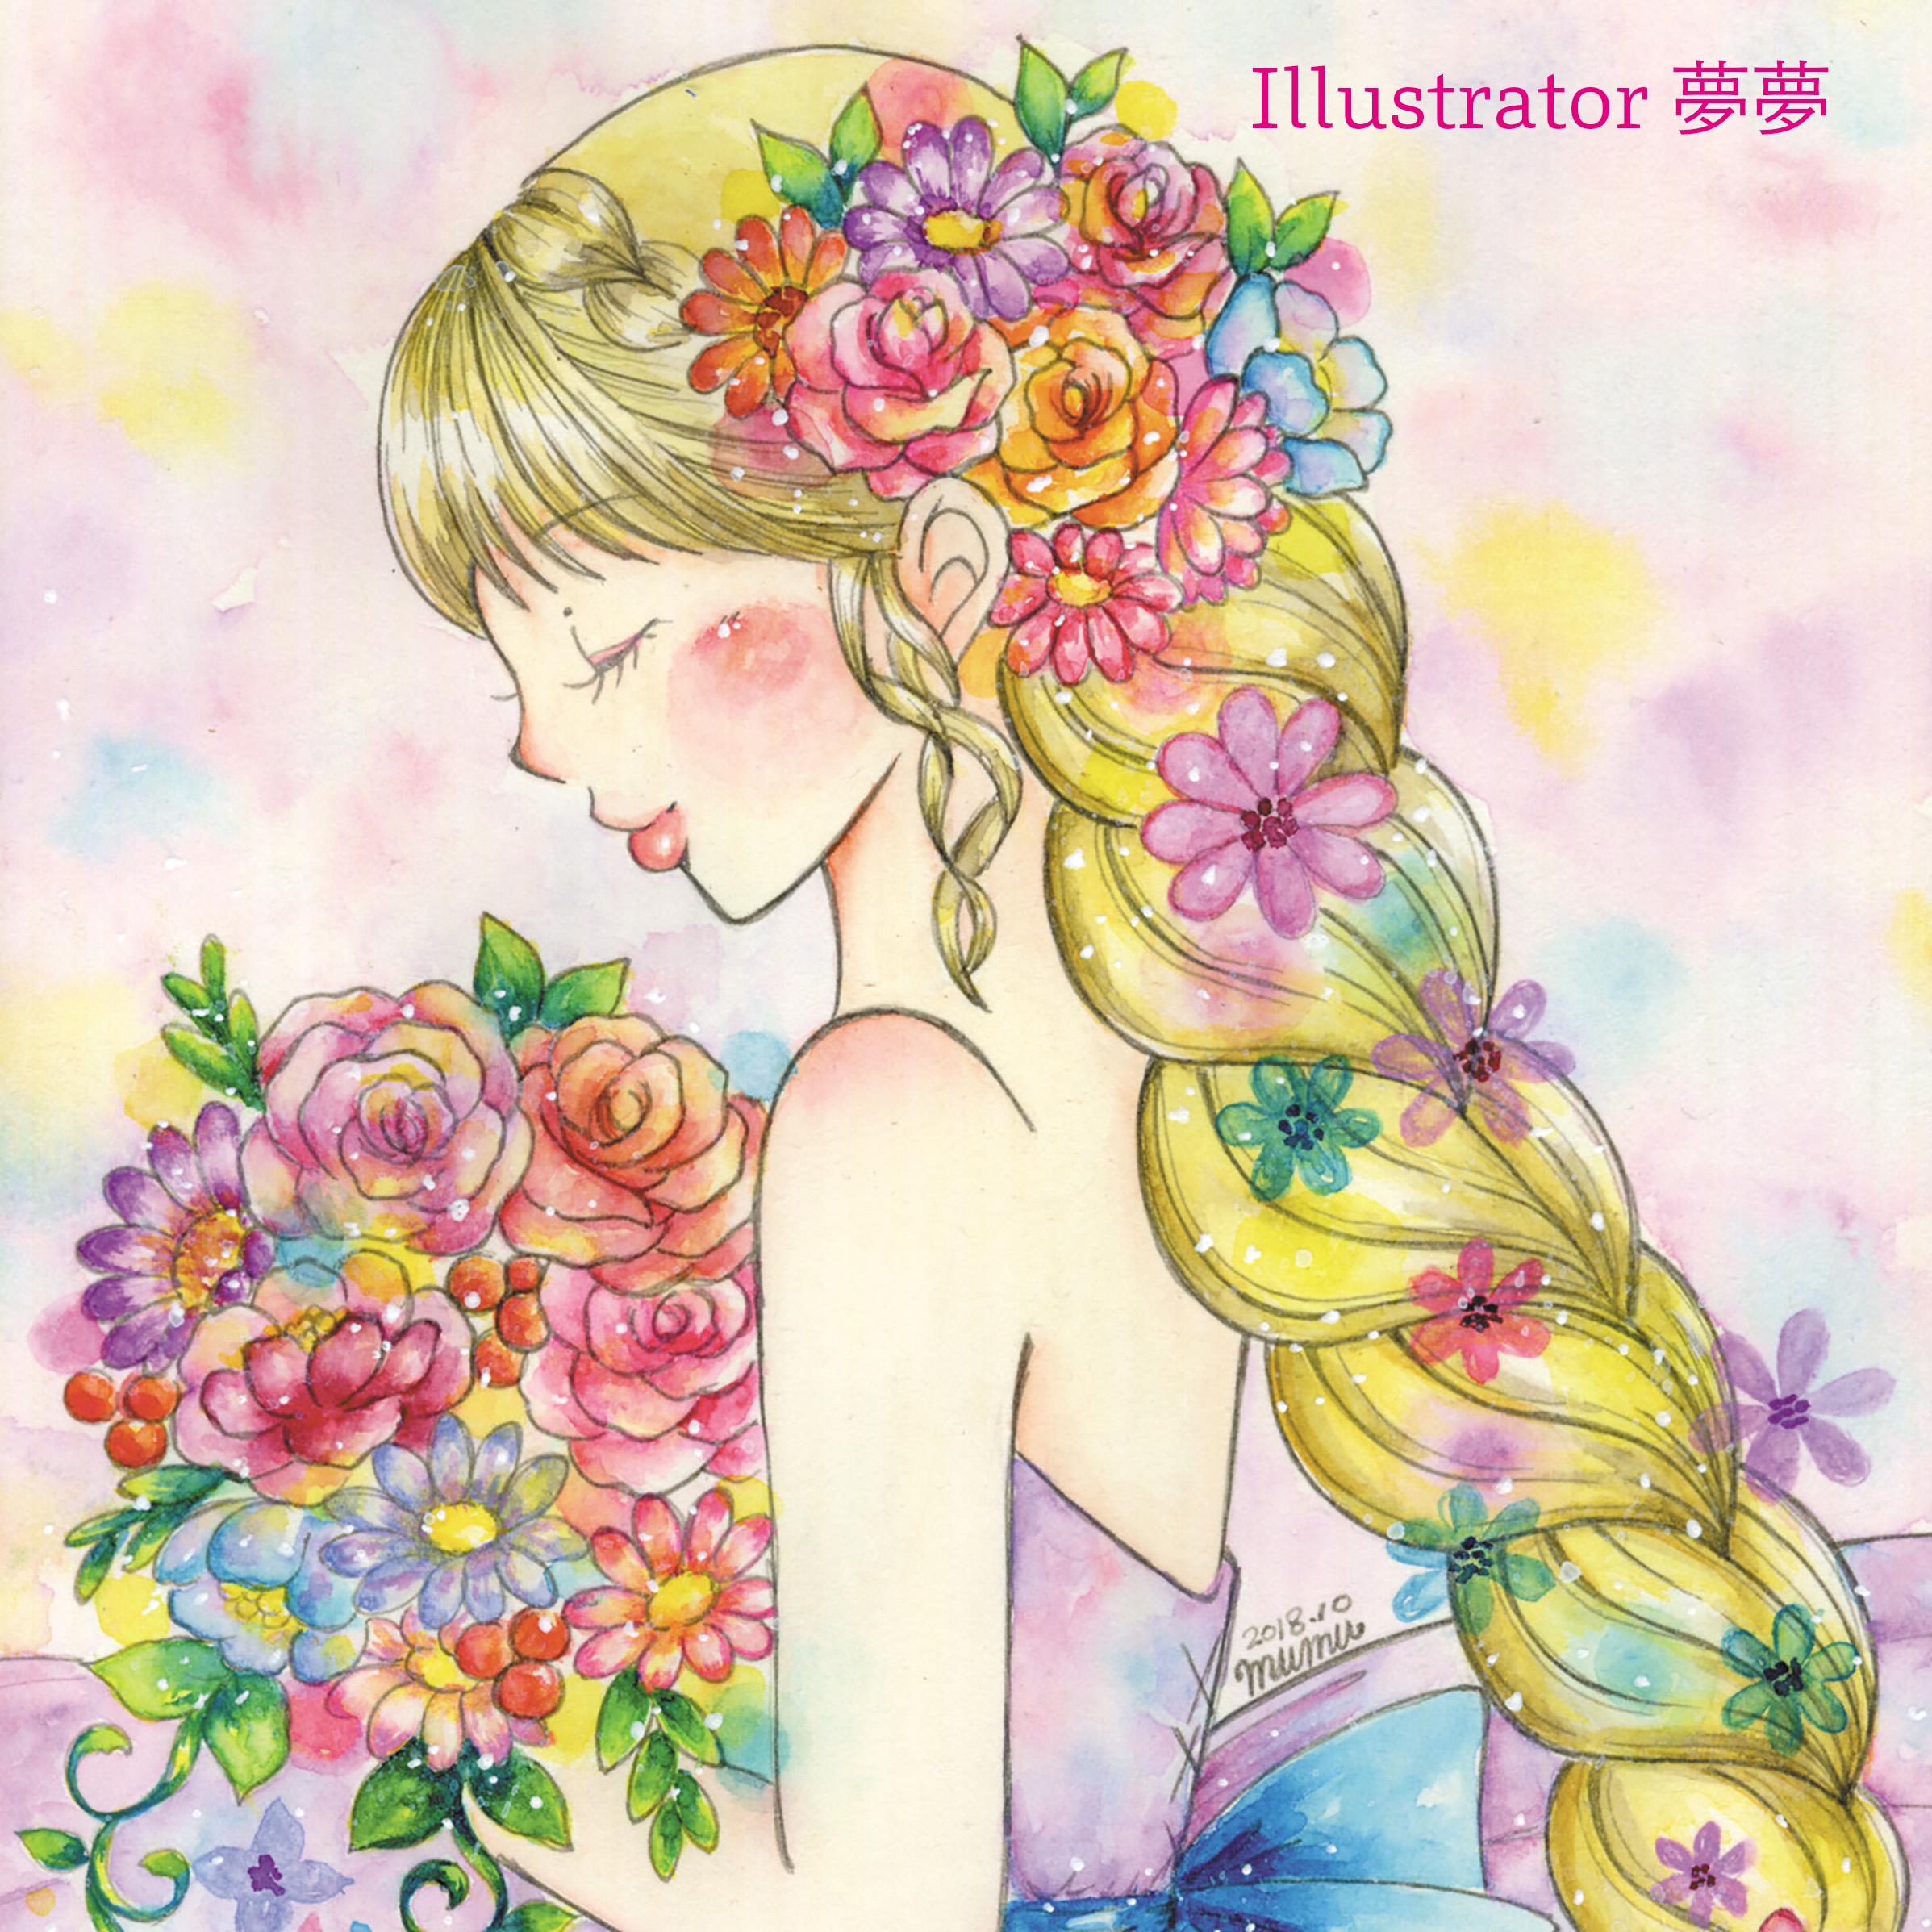 Illustrator 夢夢